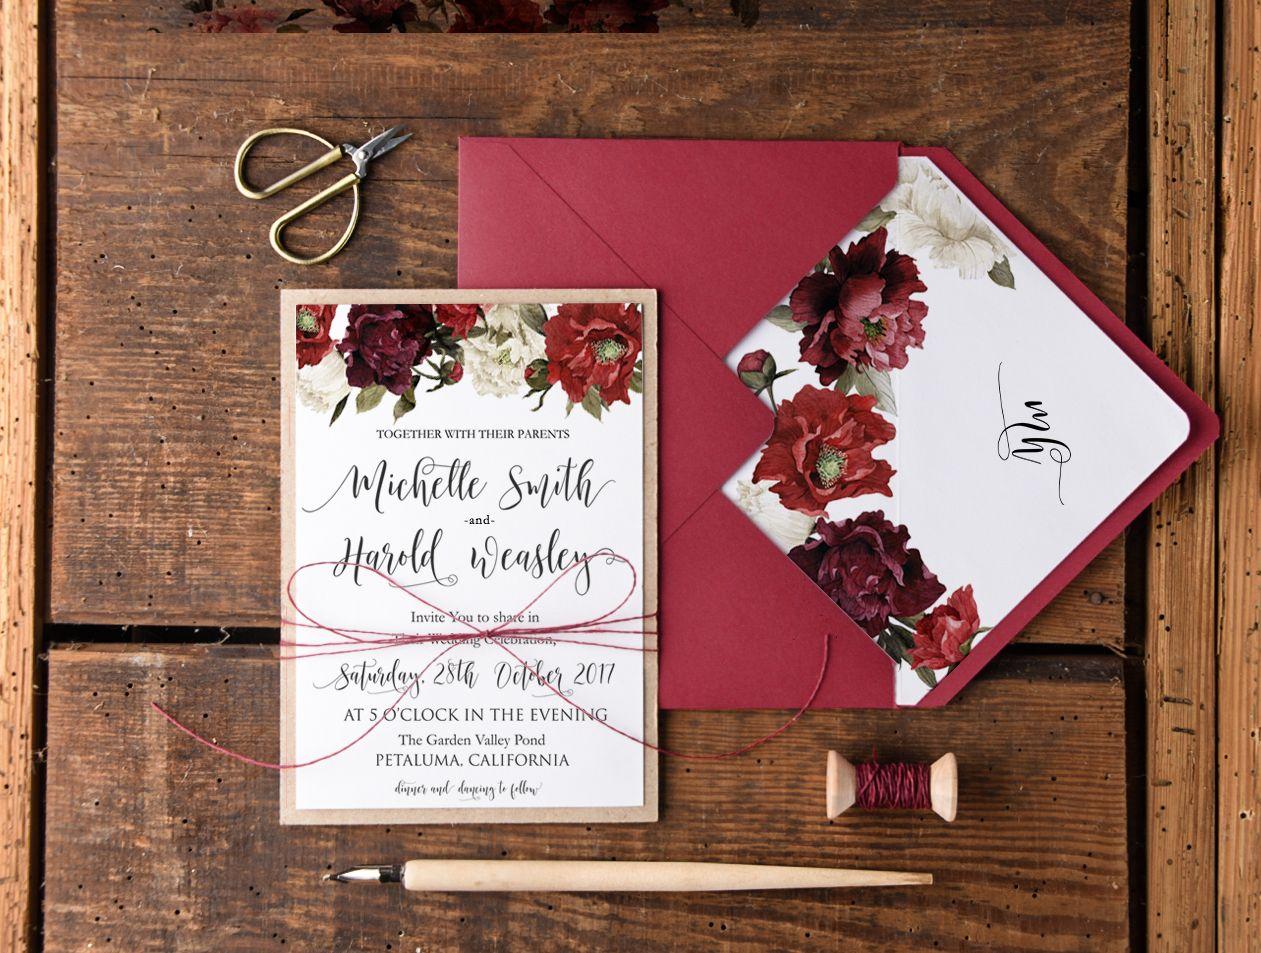 WEDDING INVITATIONS watercolor | Handmade wedding, Weddings and ...